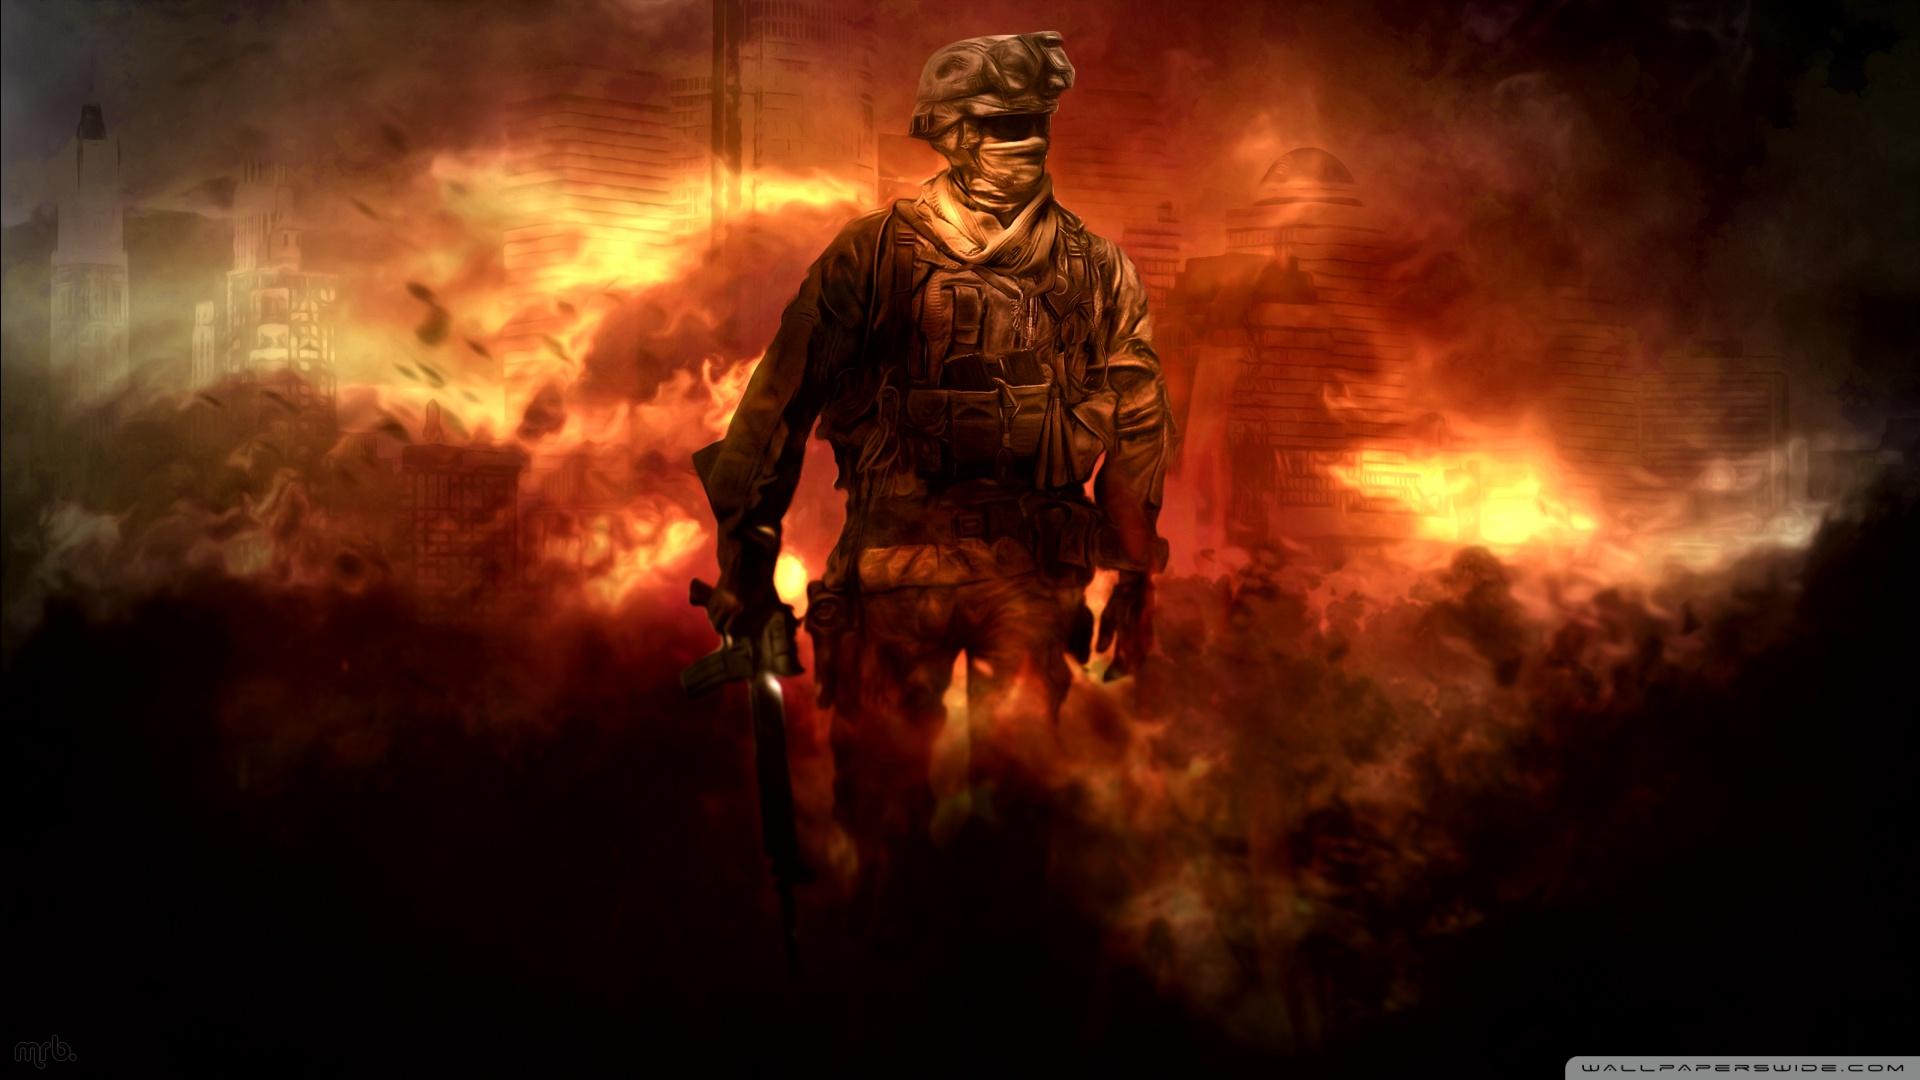 Free Download Download Call Of Duty Modern Warfare 2 Hd Wallpaper